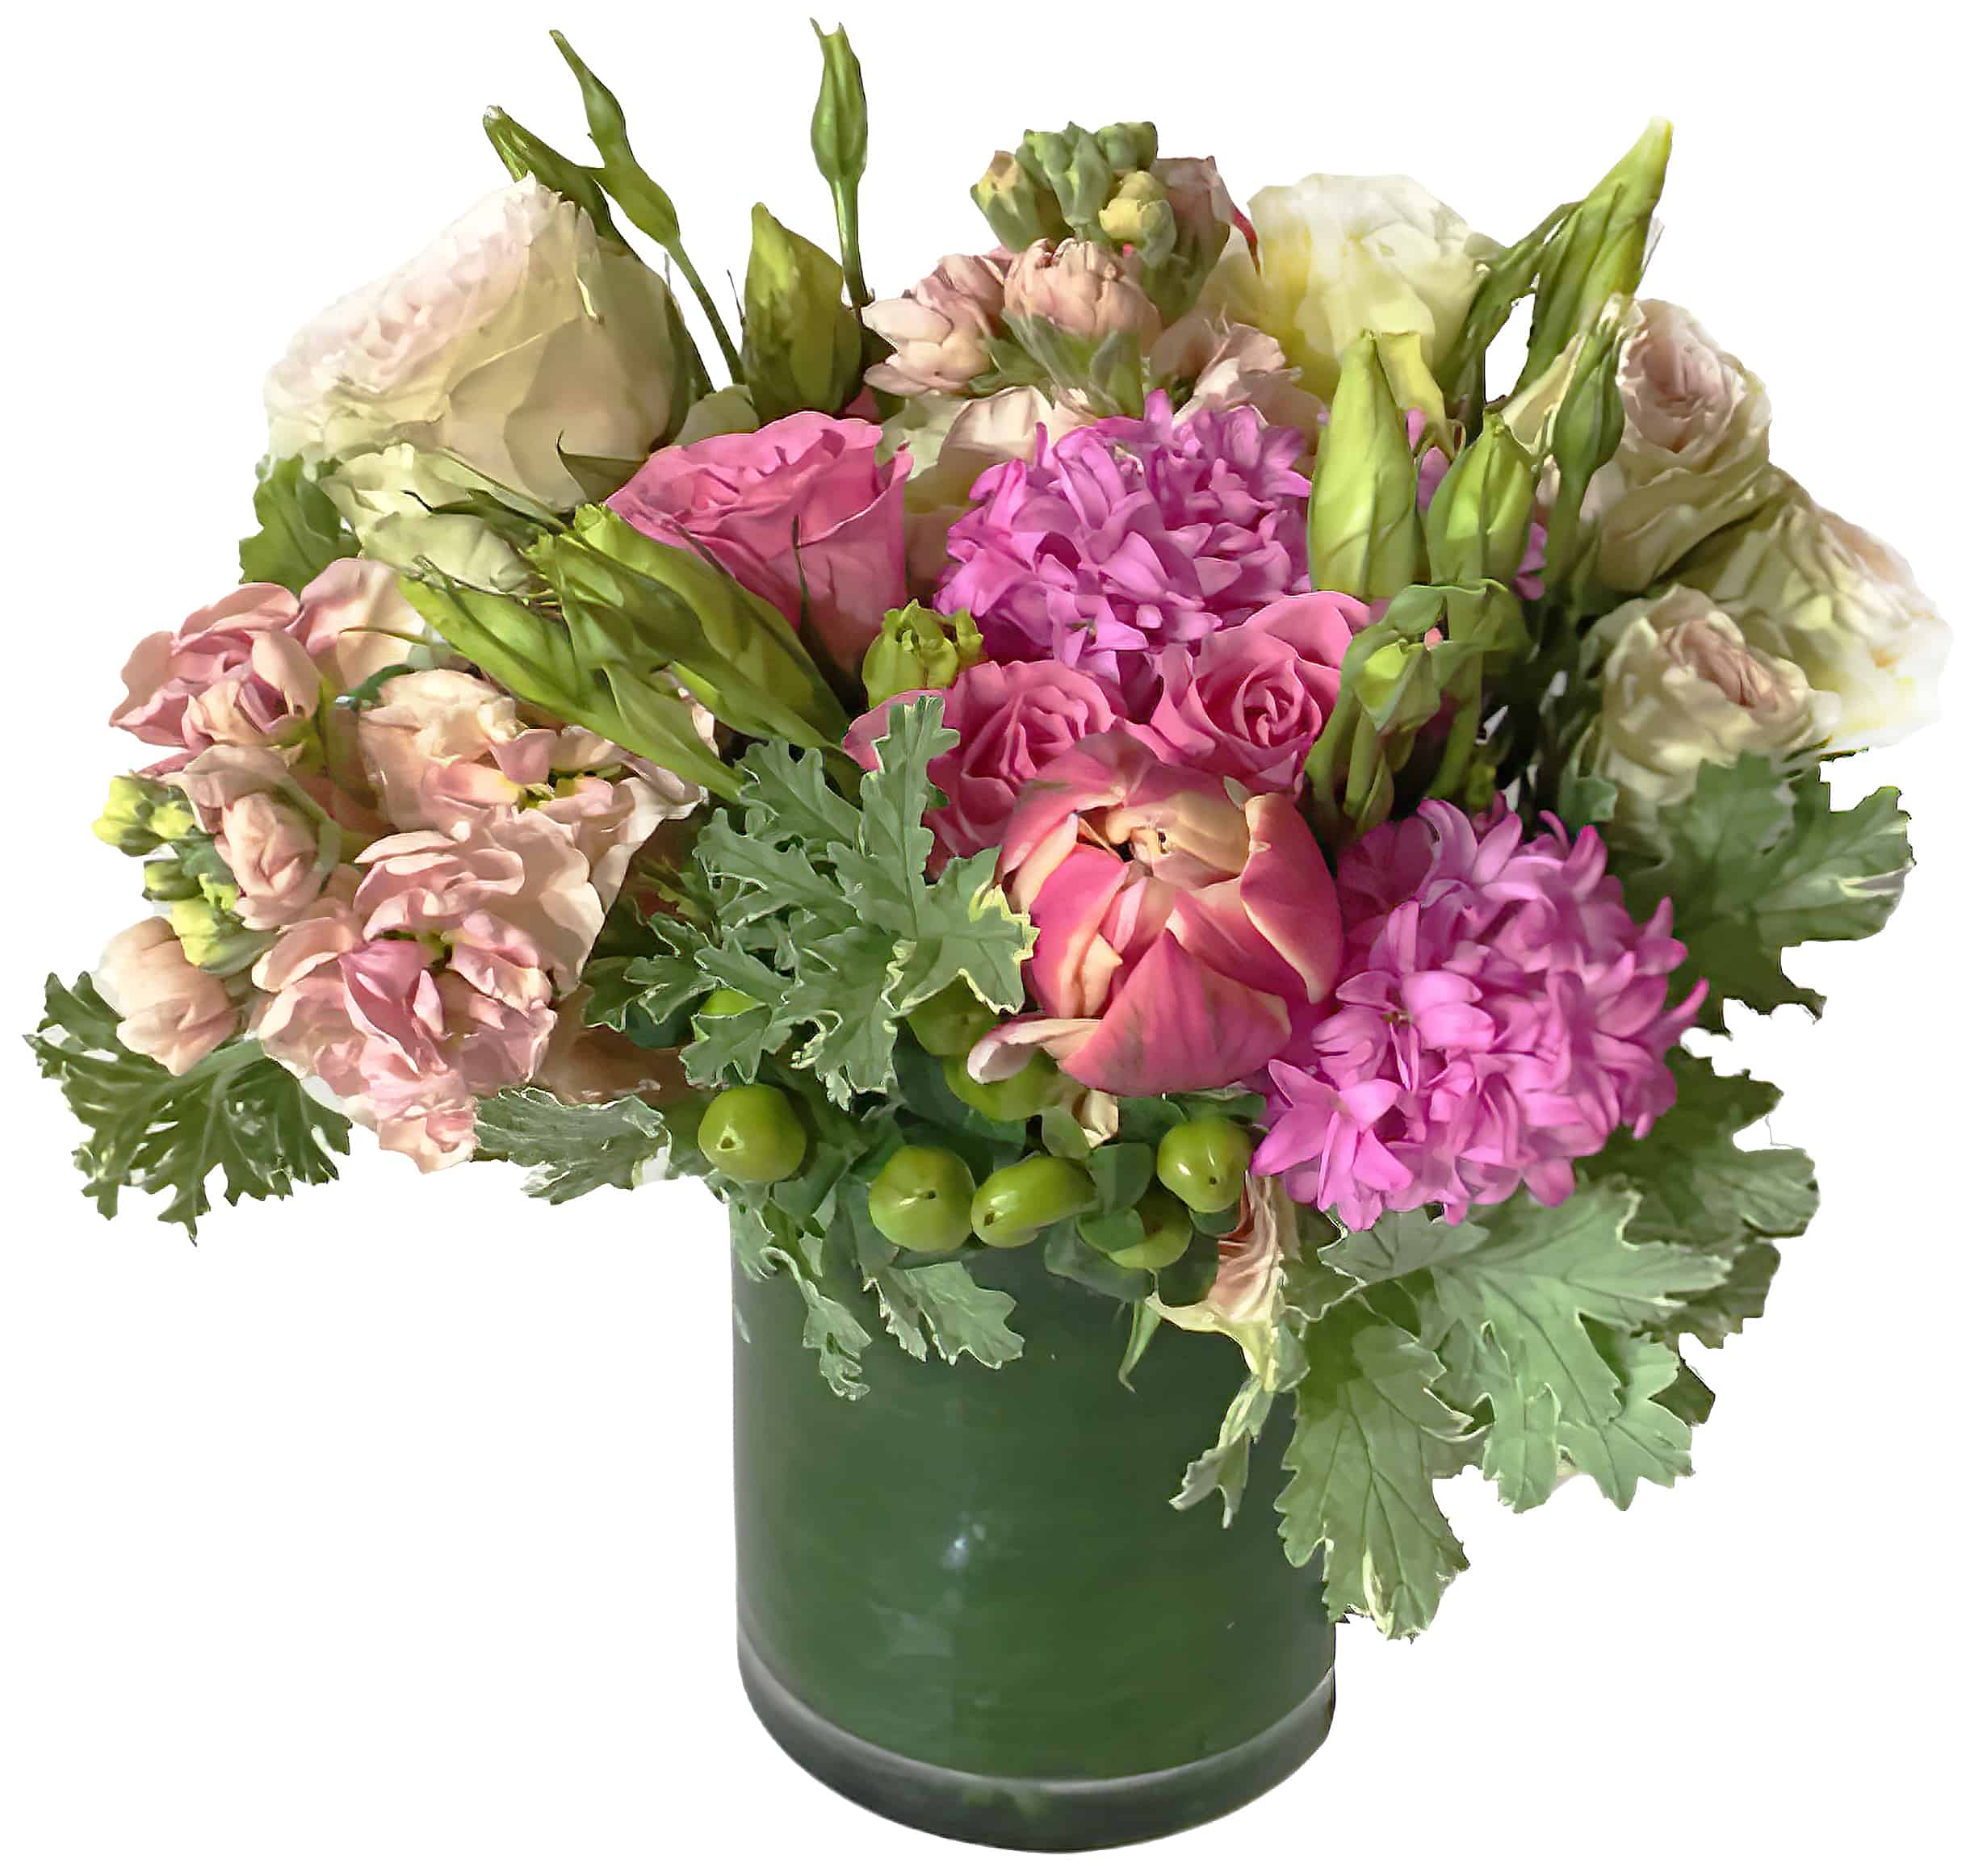 Princess Pea Flower Arrangement